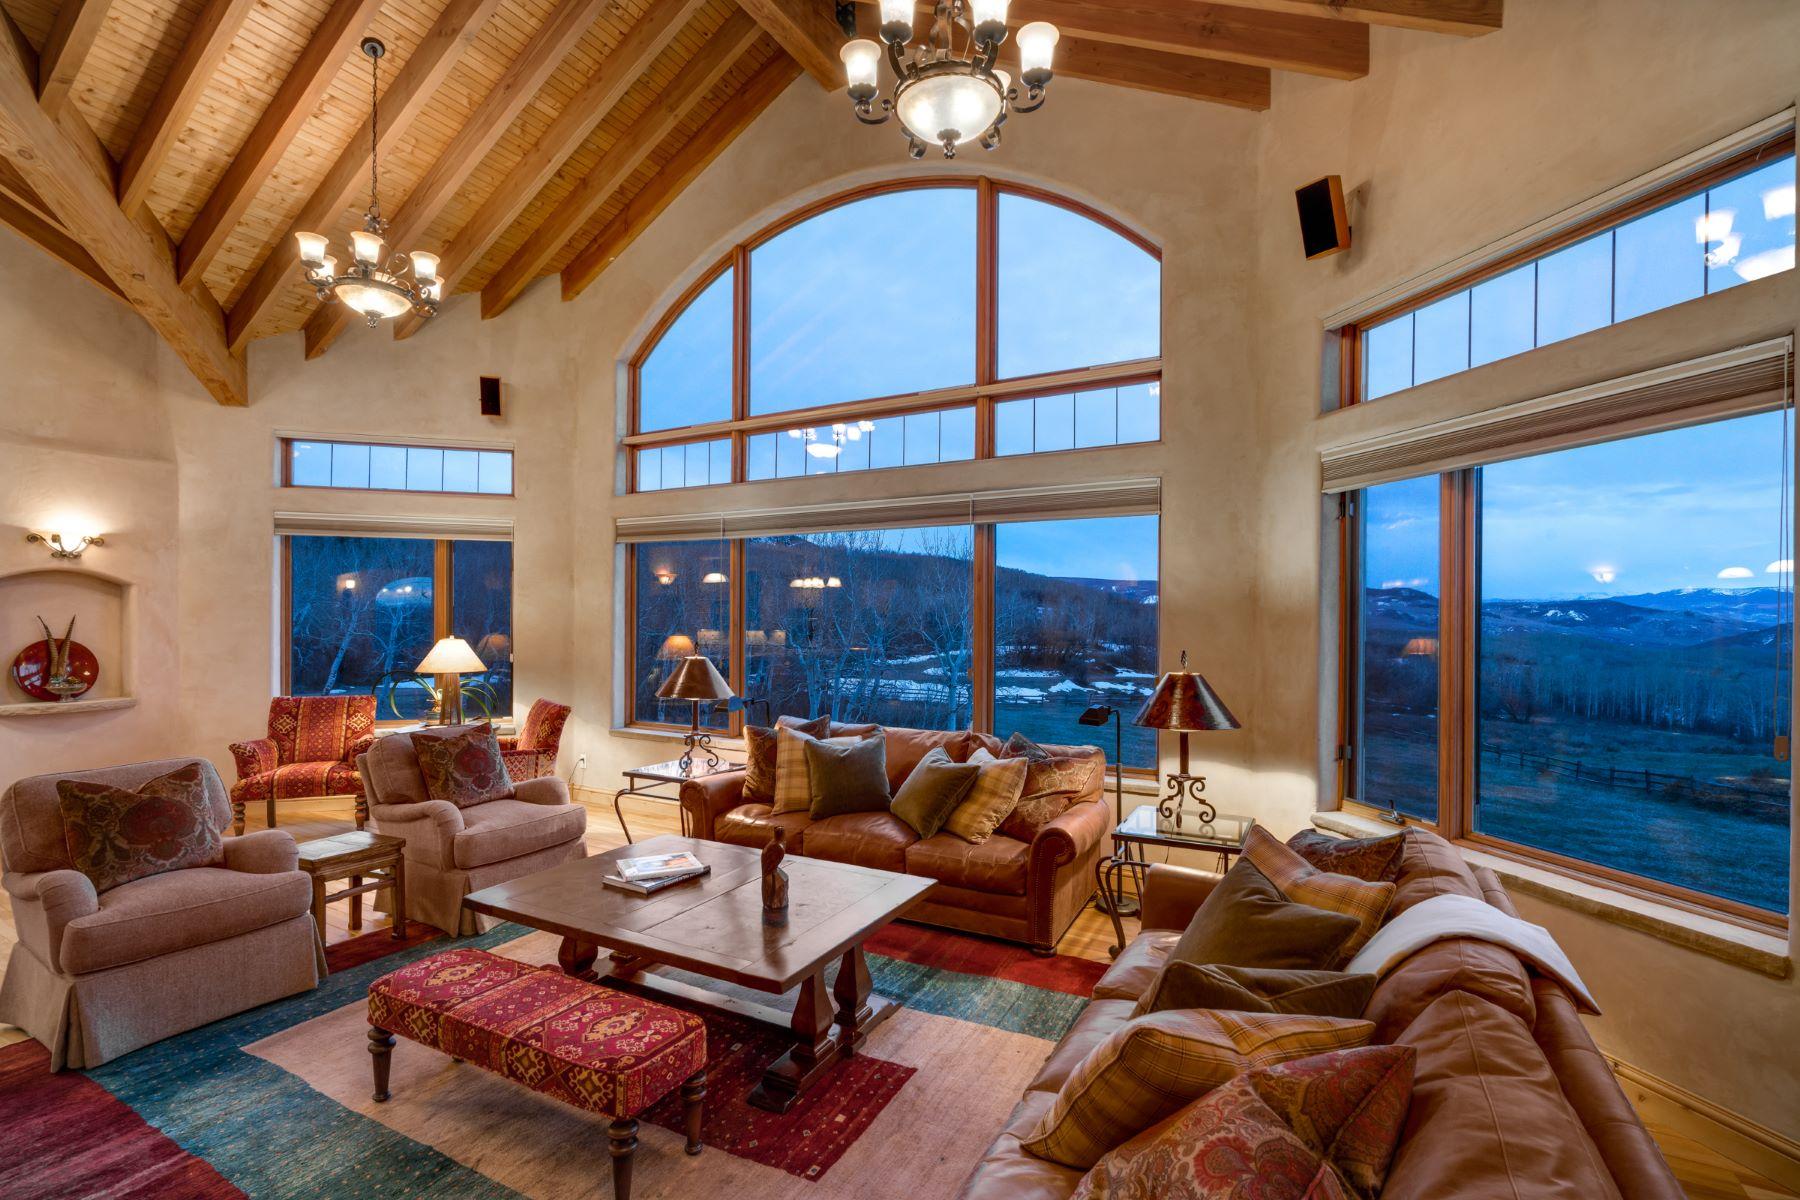 Additional photo for property listing at Lost Meadow Estate 26940 Sundance Trail 斯廷博特斯普林斯, 科罗拉多州 80487 美国